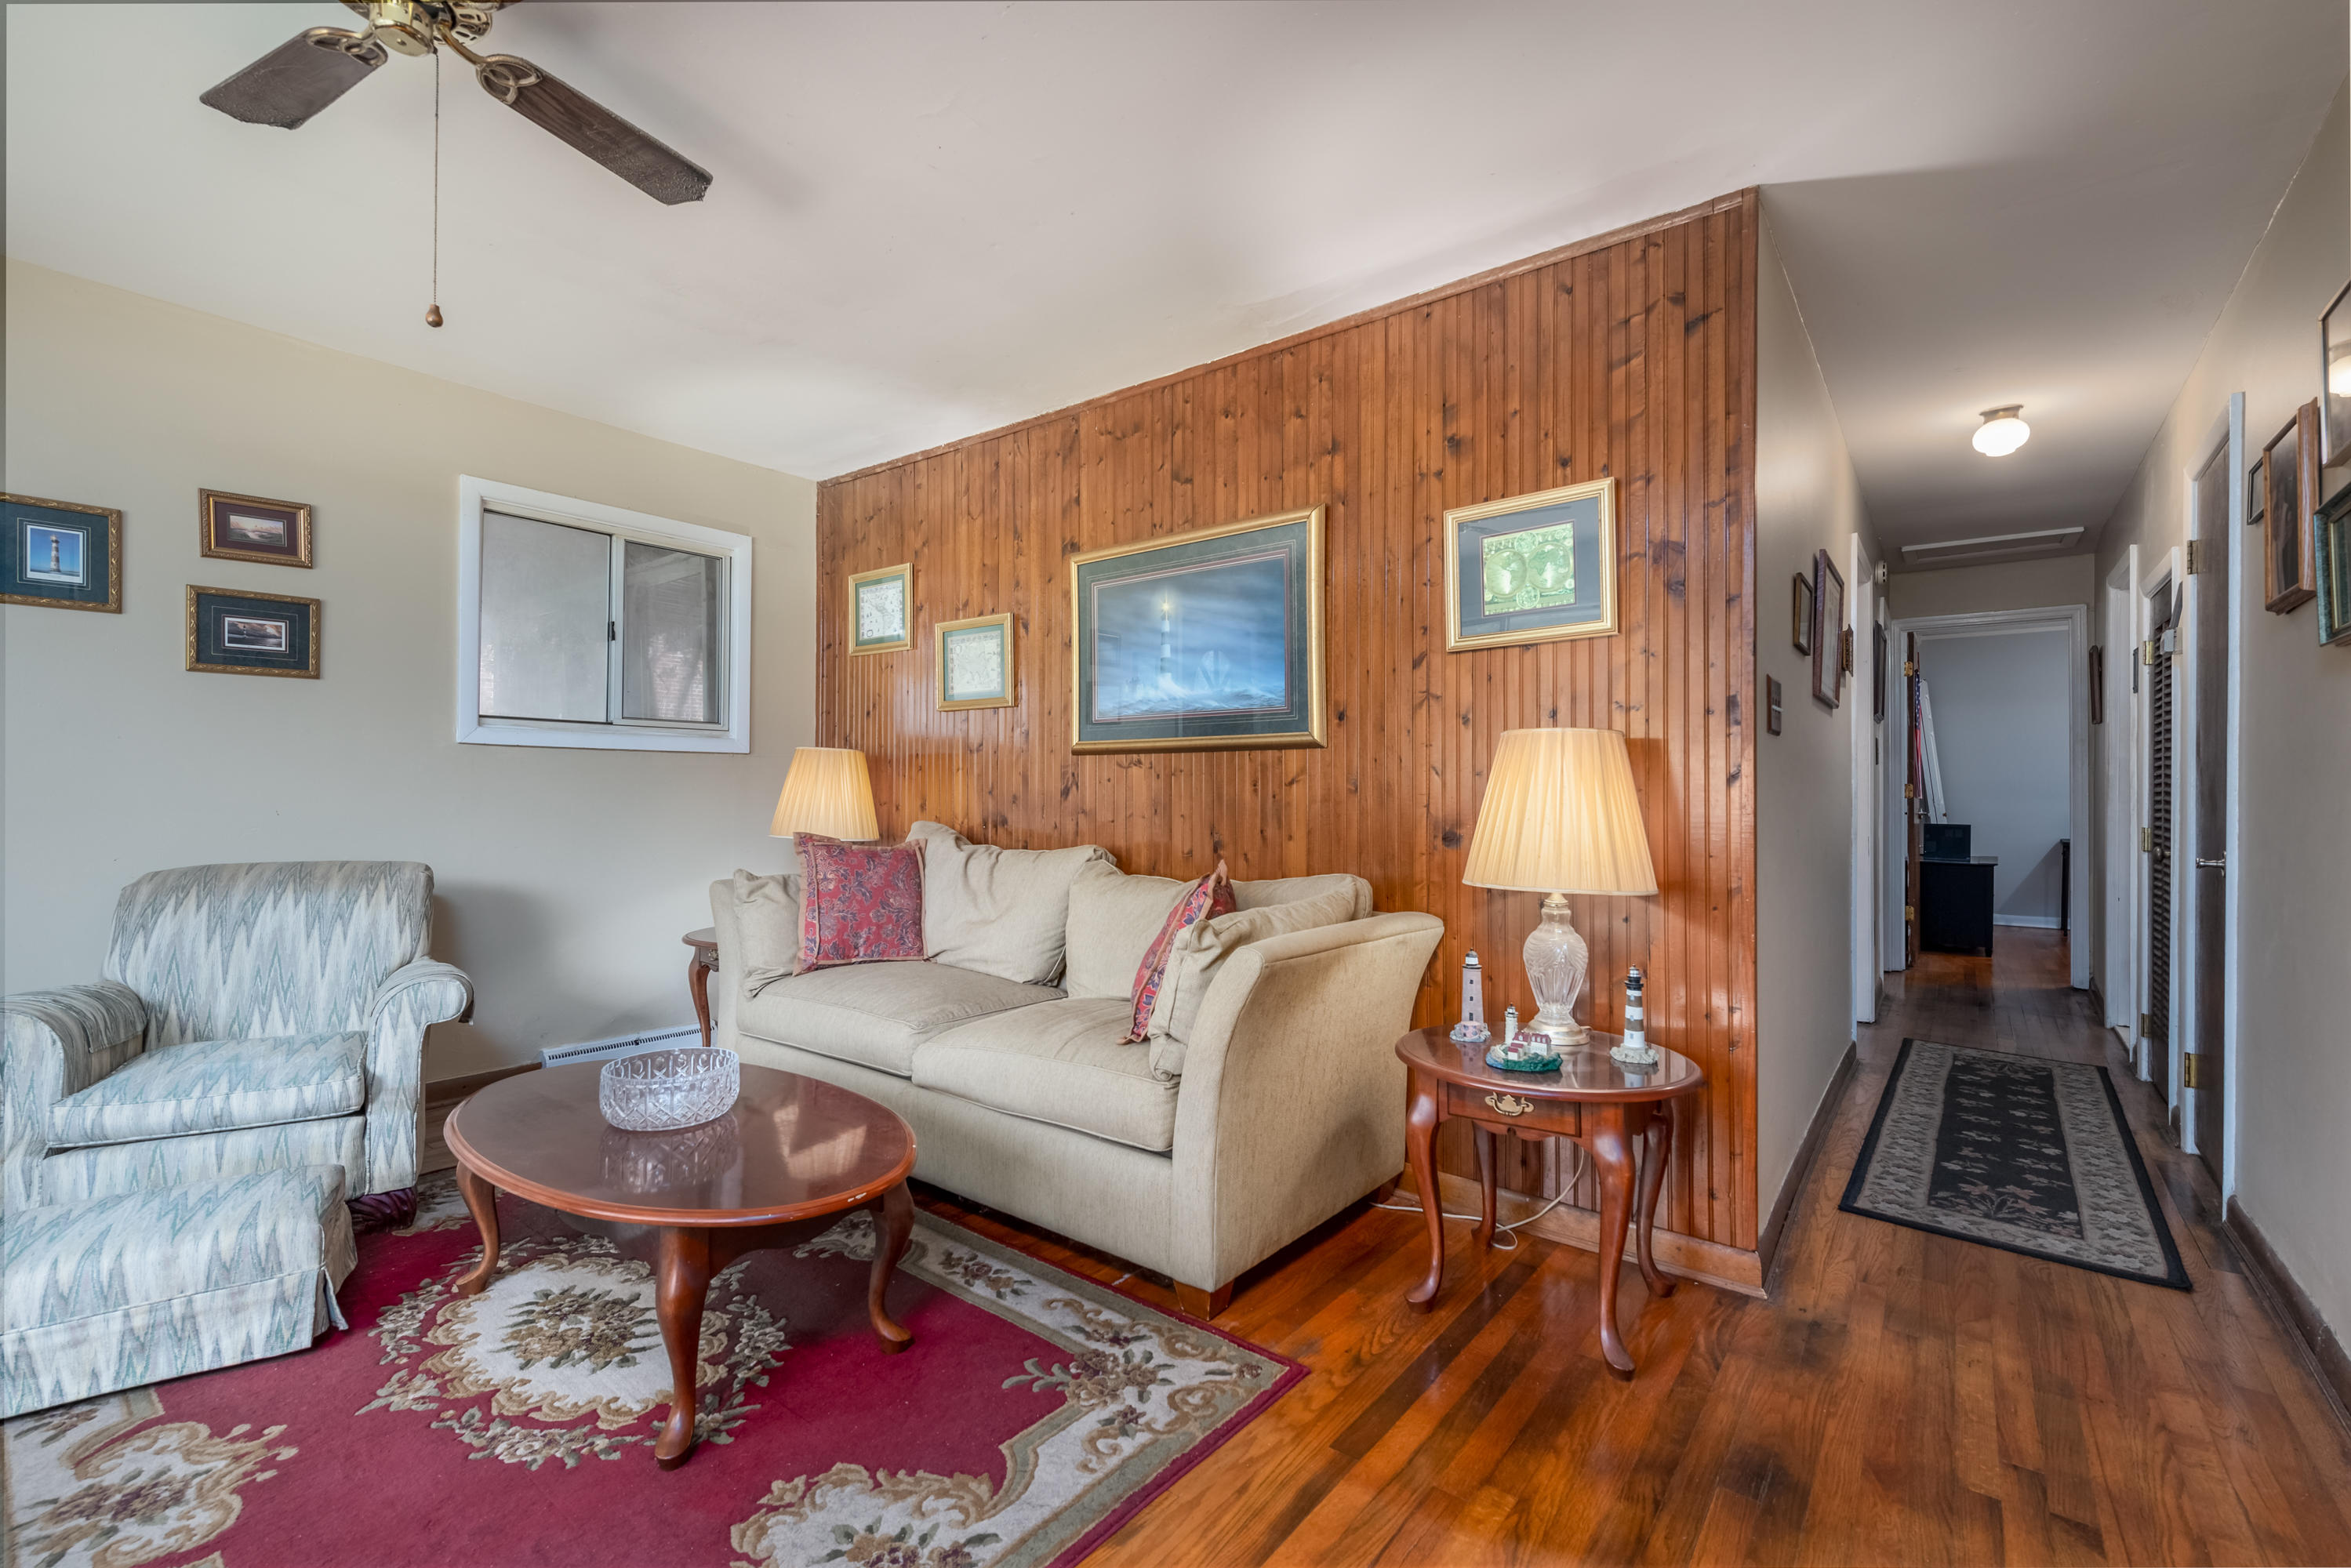 Old Mt Pleasant Homes For Sale - 916 Kincade, Mount Pleasant, SC - 6